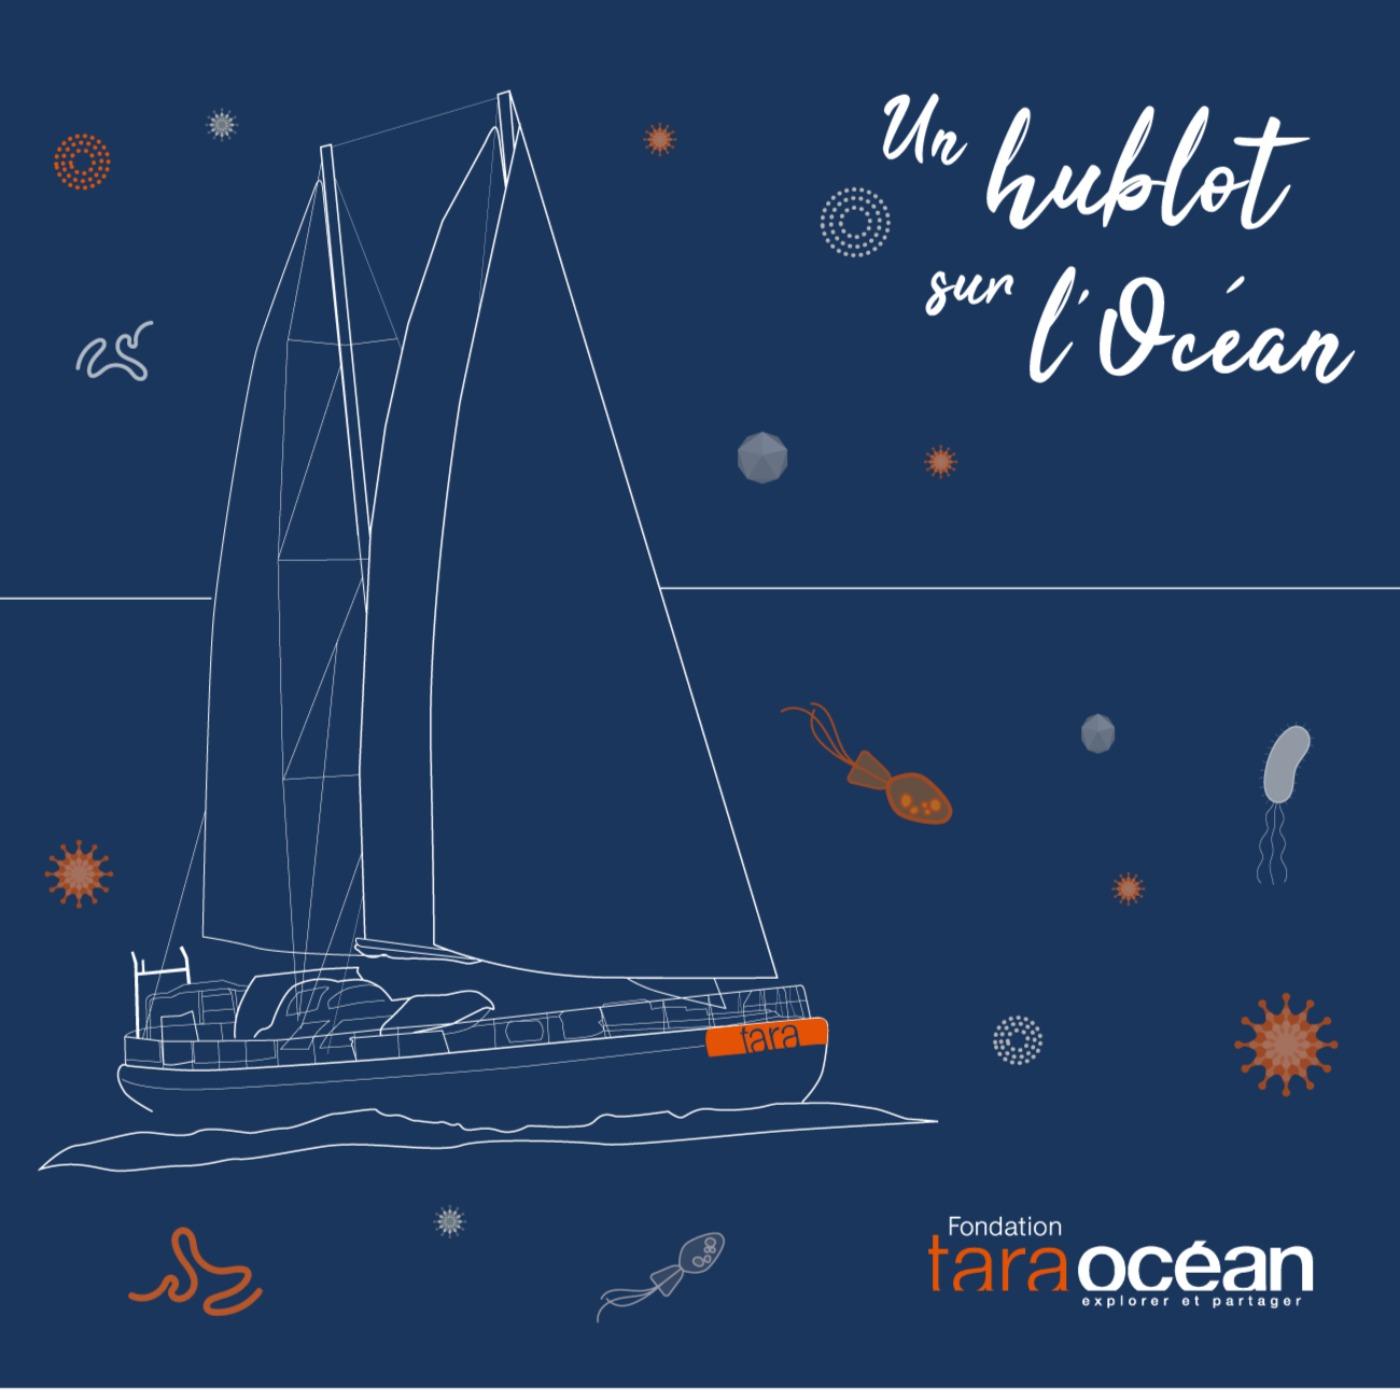 Un hublot sur l'Océan - Fondation Tara Océan